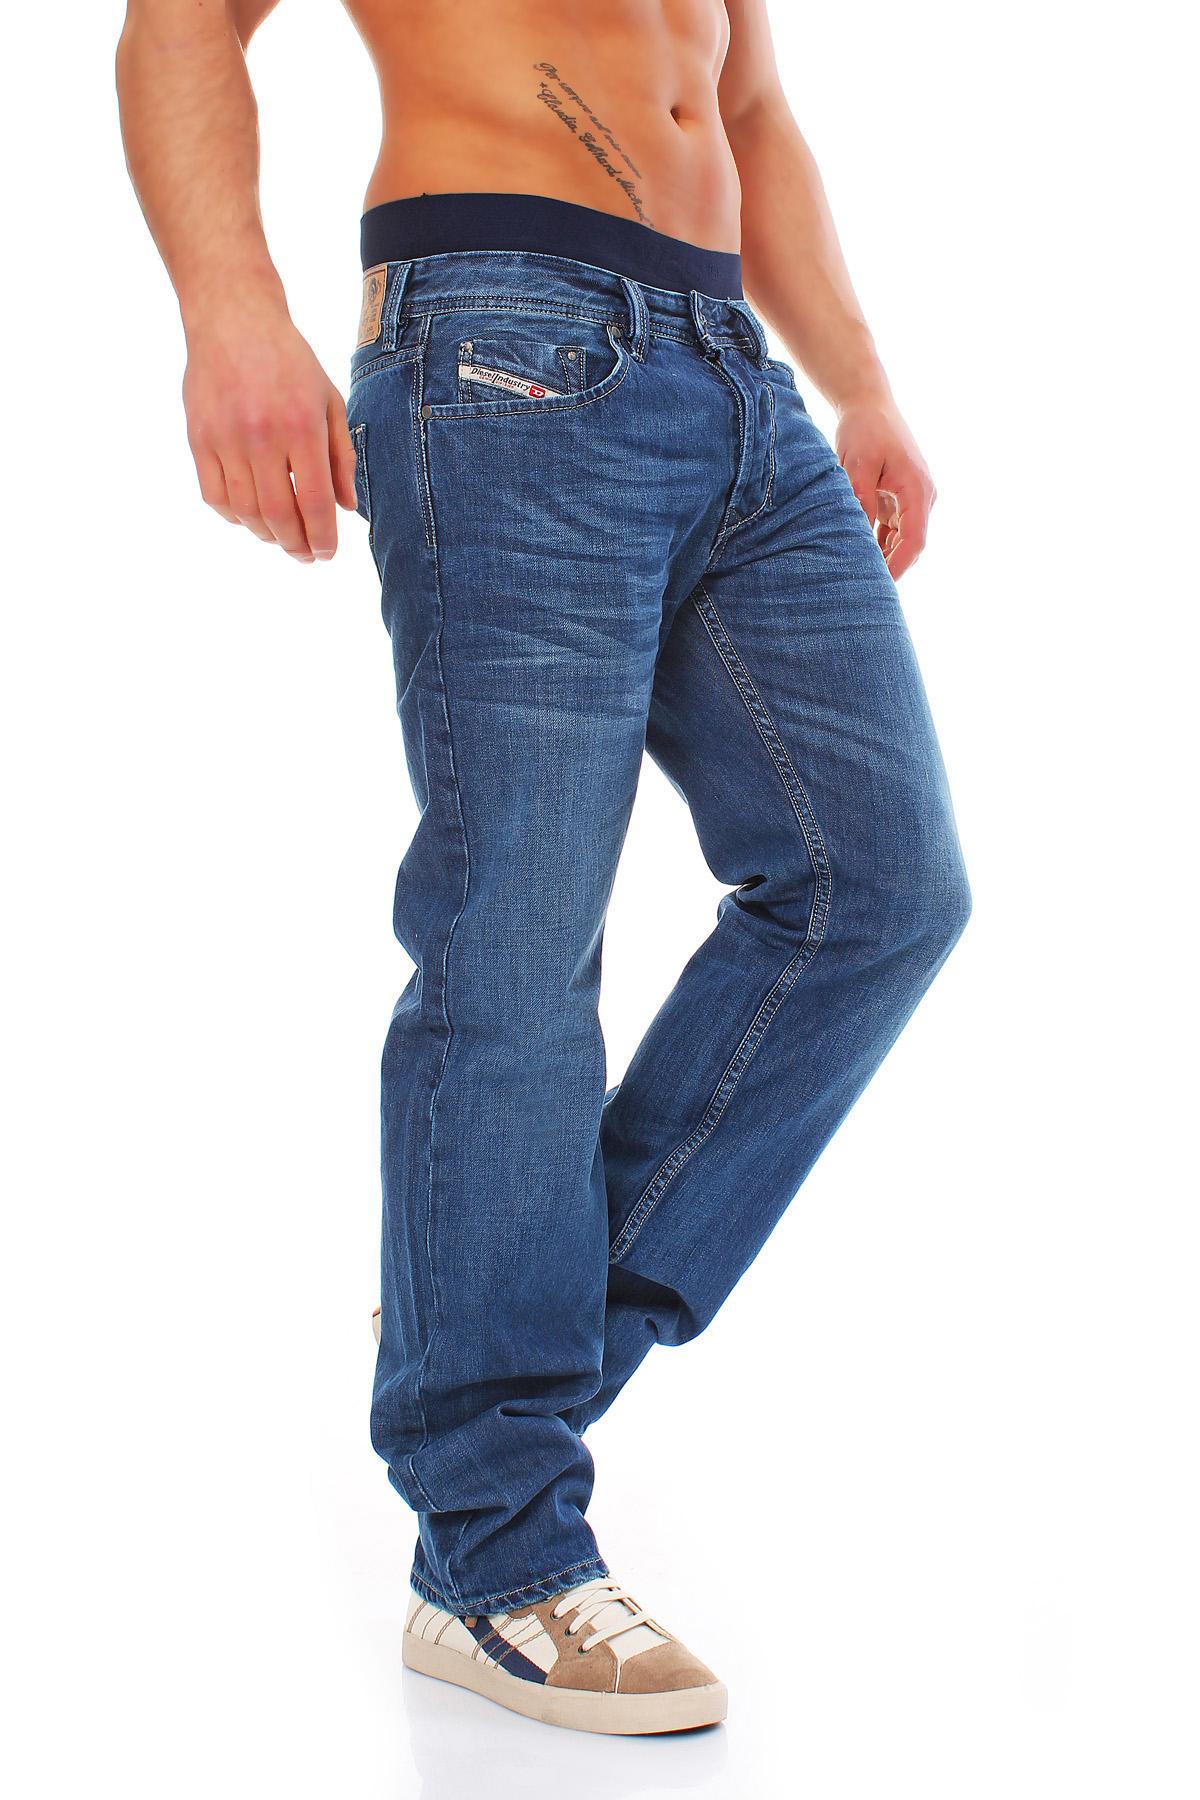 4fc8e18d Details about Diesel Jeans Larkee 008xr 8xr Mens Pants Regular Straight  Blue New